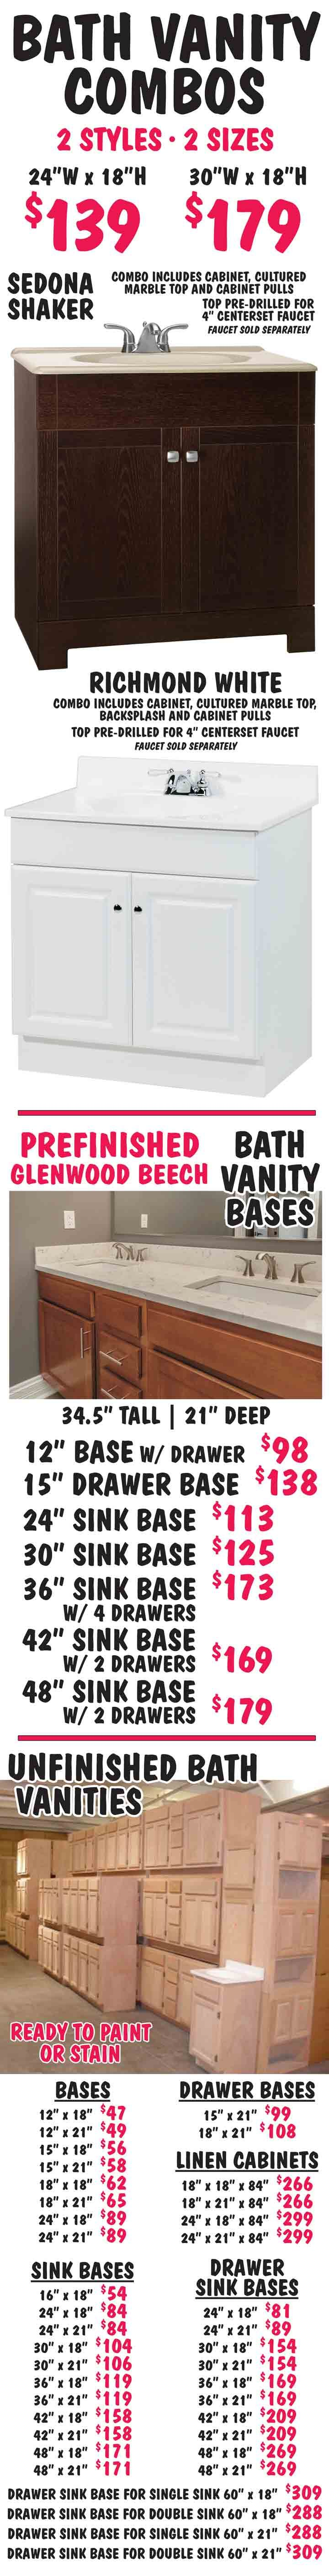 Southeastern Salvage Home Emporium Chesapeake Kitchen And Bath Vanity Combos Vanity Bases